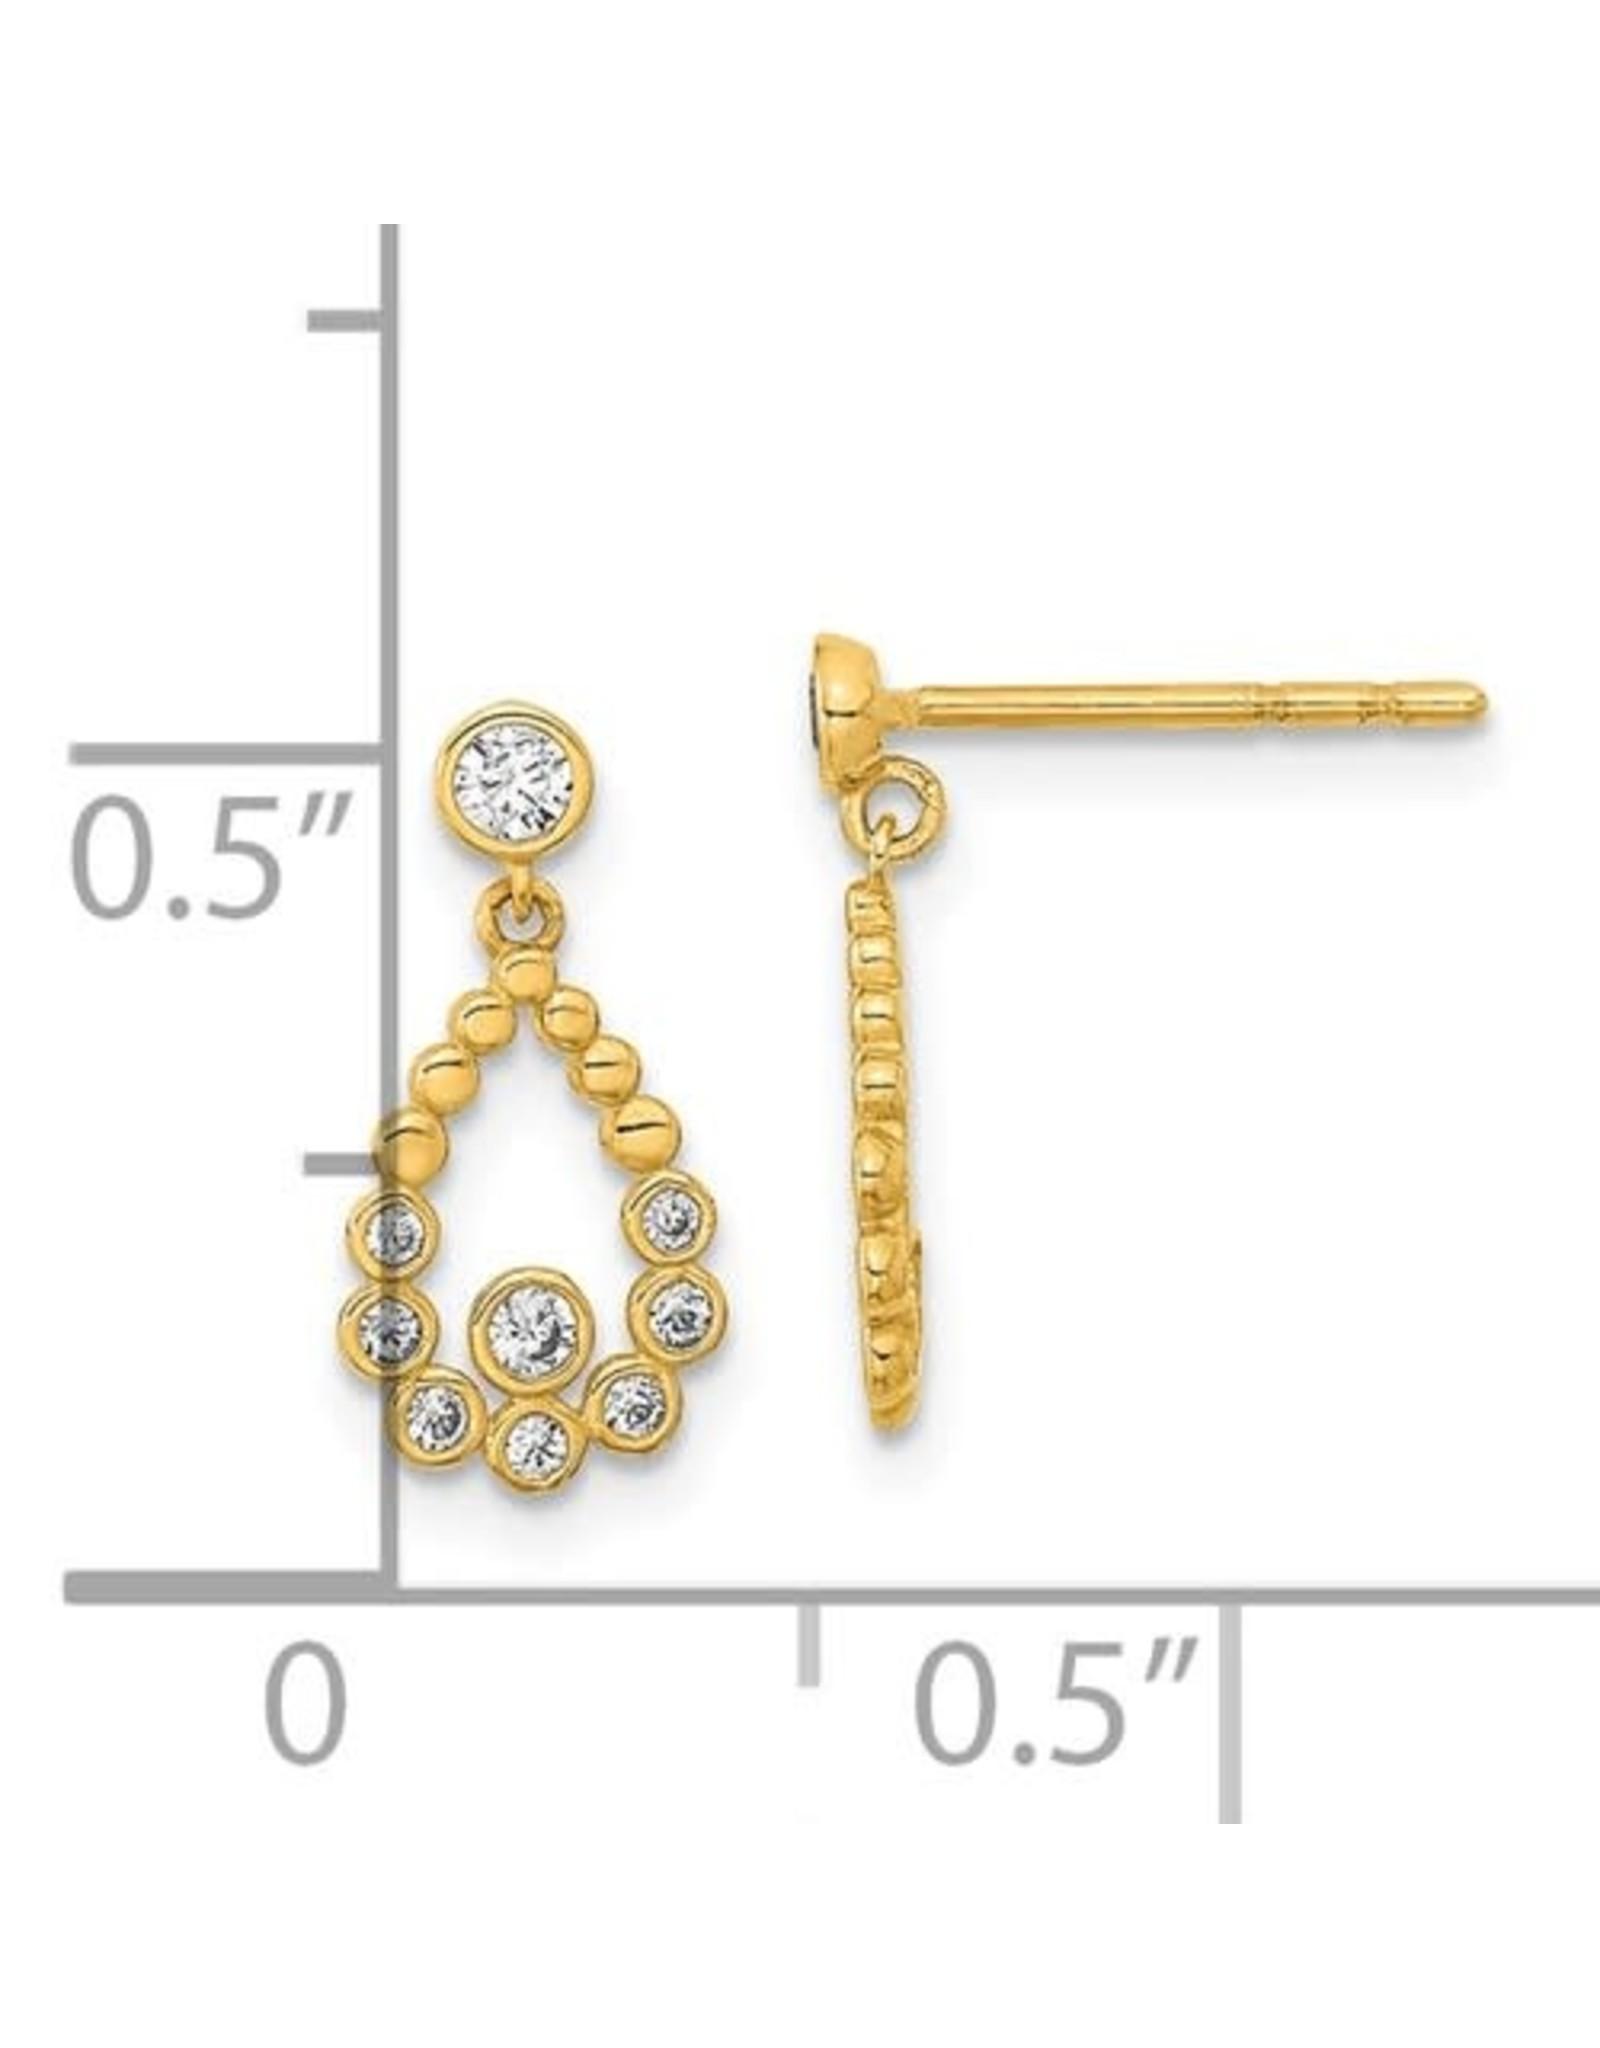 14K Young Lady's Elegant Yellow Gold Zirconia Tear Drop Earrings